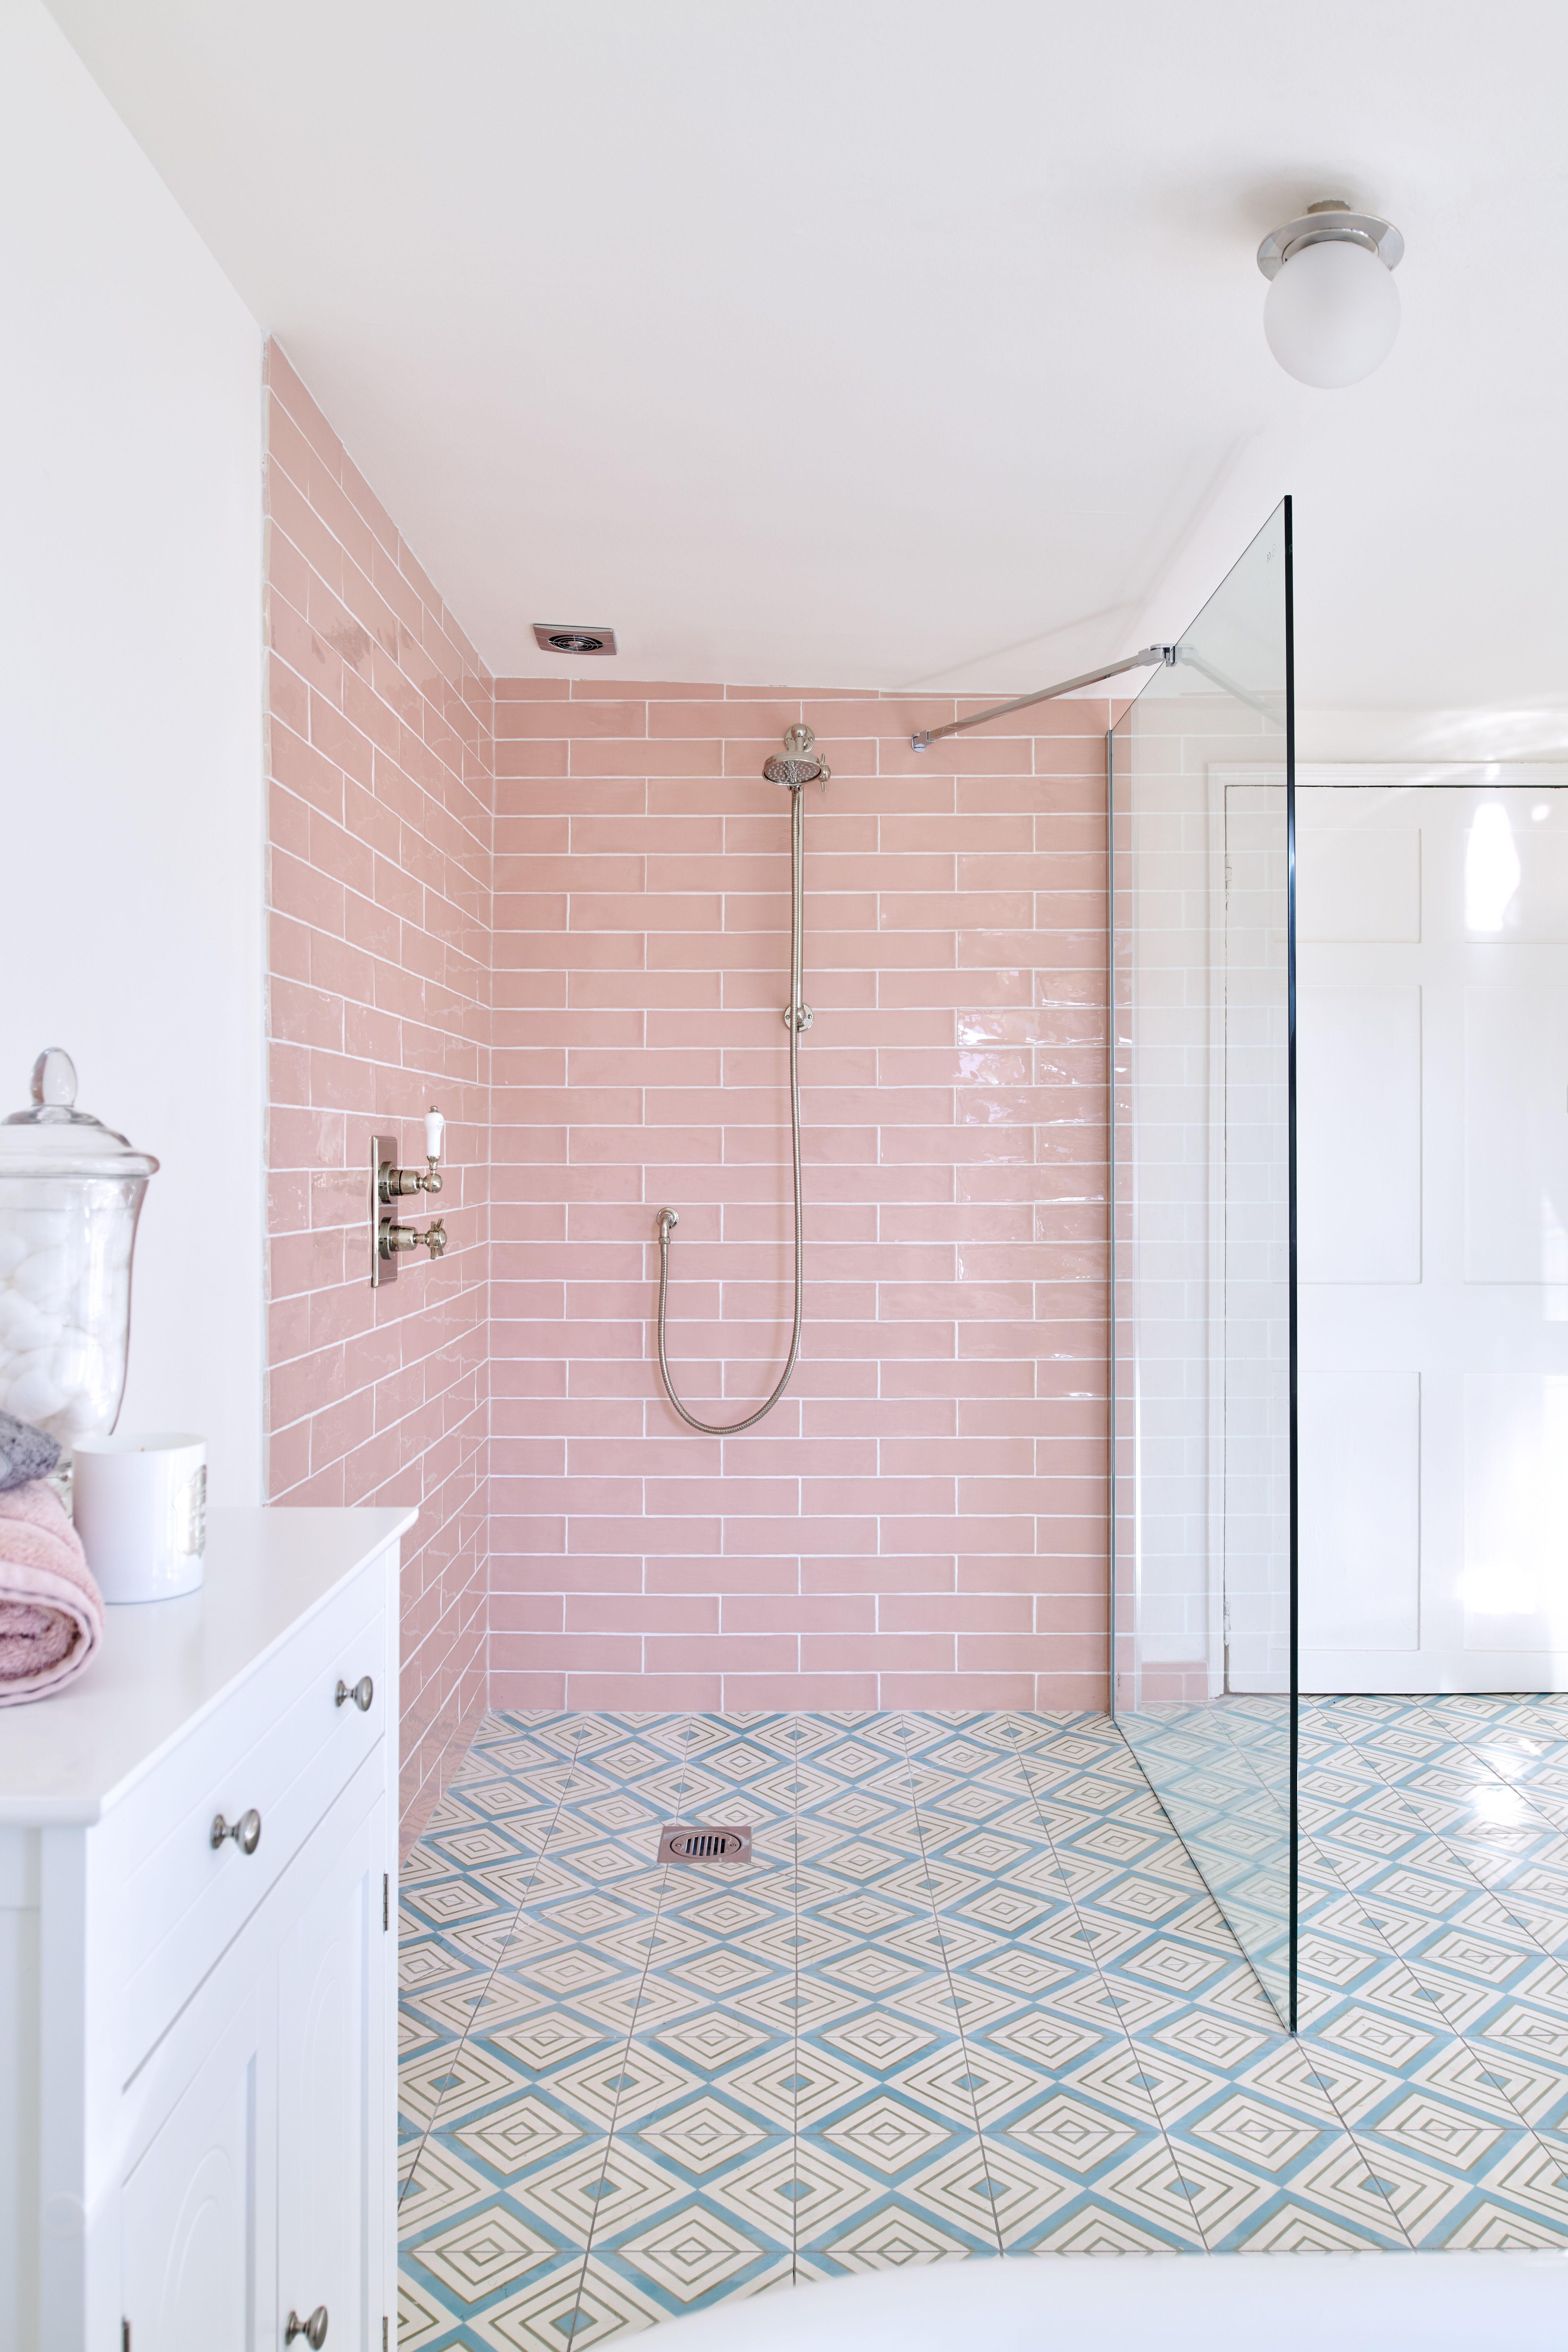 Carter Ceramic Rose Tiles Ca Pietra In 2020 Bathroom Interior Design Pink Bathroom Tiles Glamorous Bathroom Decor